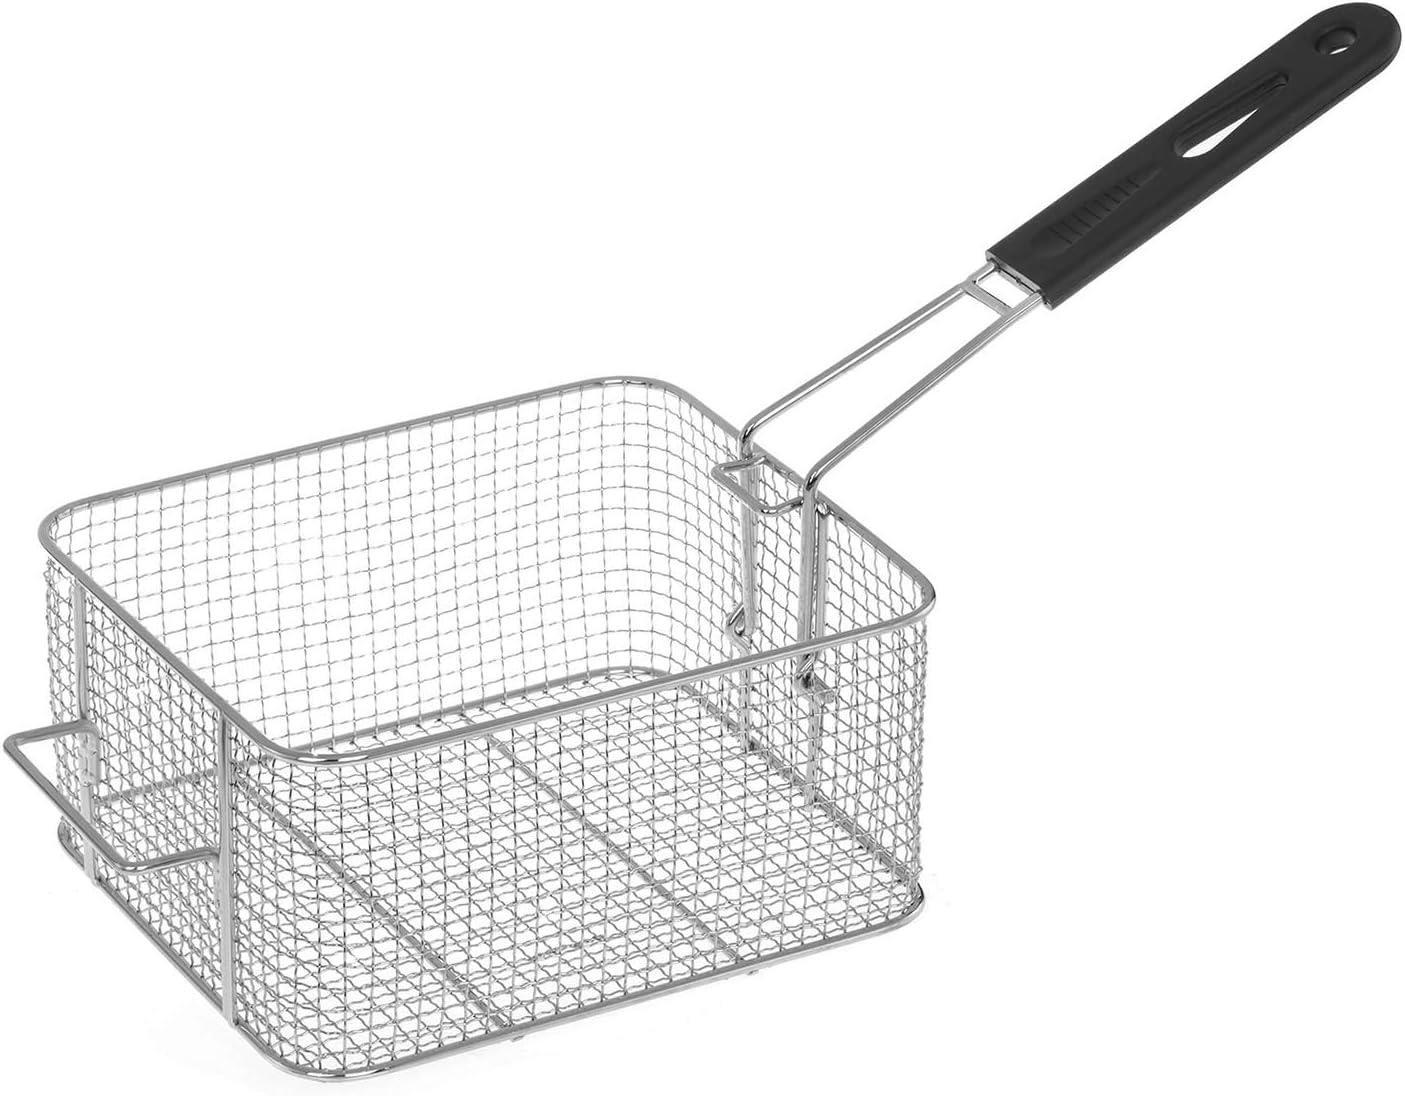 Royal Catering Freidora Industrial Profesional RCEF-10DY-ECO (doble con doc cestas 2 x 10 Litros, 2 x 3.200 W, 230 V, Termostato, Acero Inoxidable): Amazon.es: Hogar